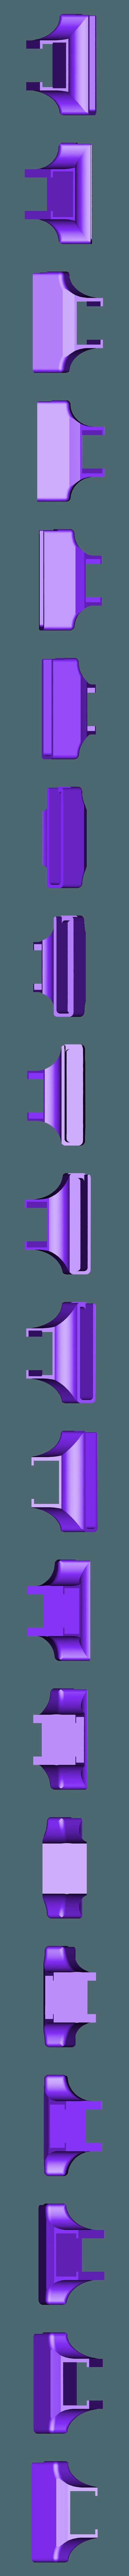 stand_briquet.stl Download free STL file stand briquet plasma • Model to 3D print, Cyborg